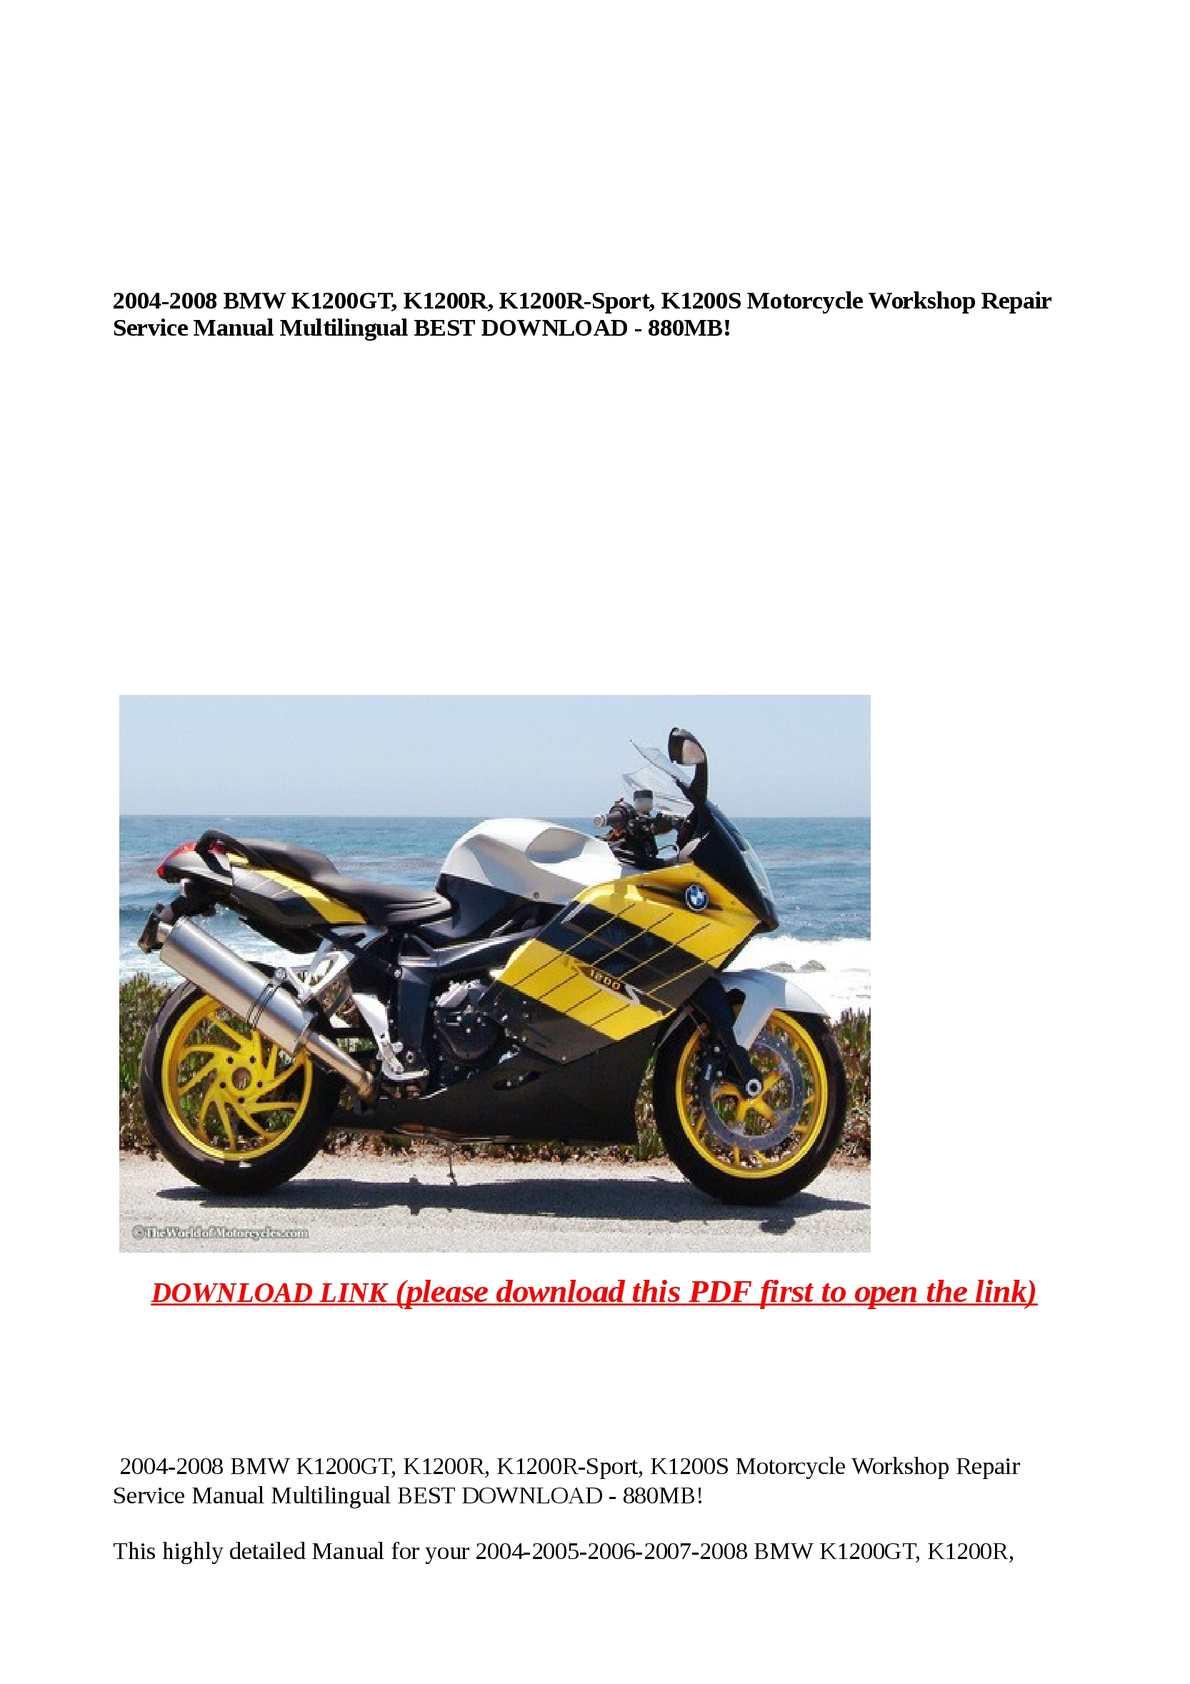 Calaméo - 2004-2008 BMW K1200GT, K1200R, K1200R-Sport, K1200S Motorcycle  Workshop Repair S | Bmw K1200gt Wiring Diagram |  | Calaméo